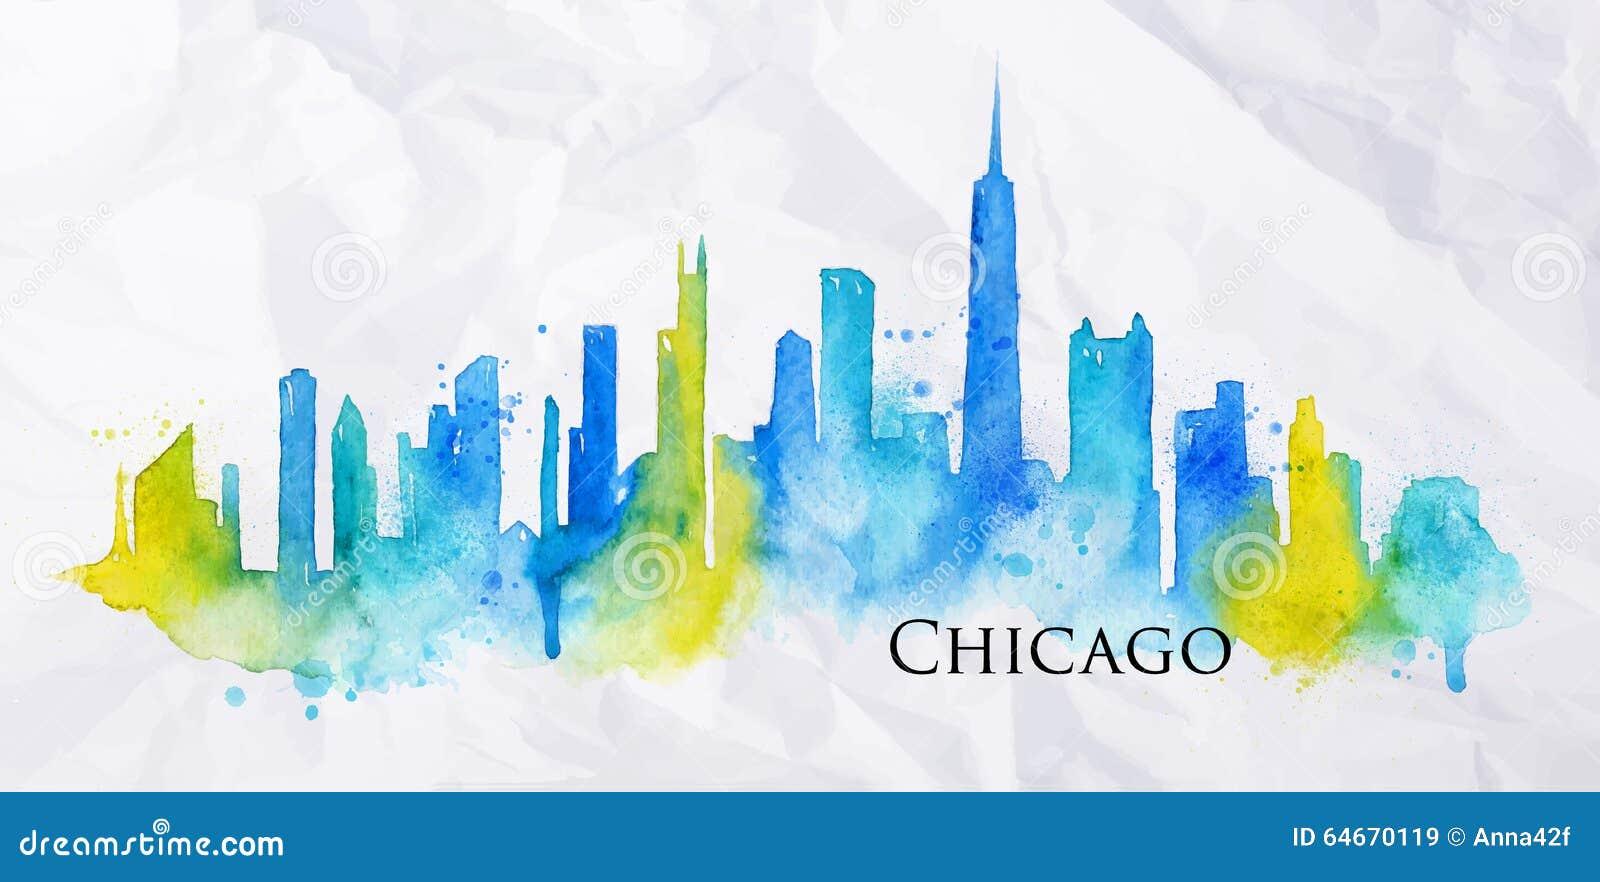 Aquarelle Chicago de silhouette